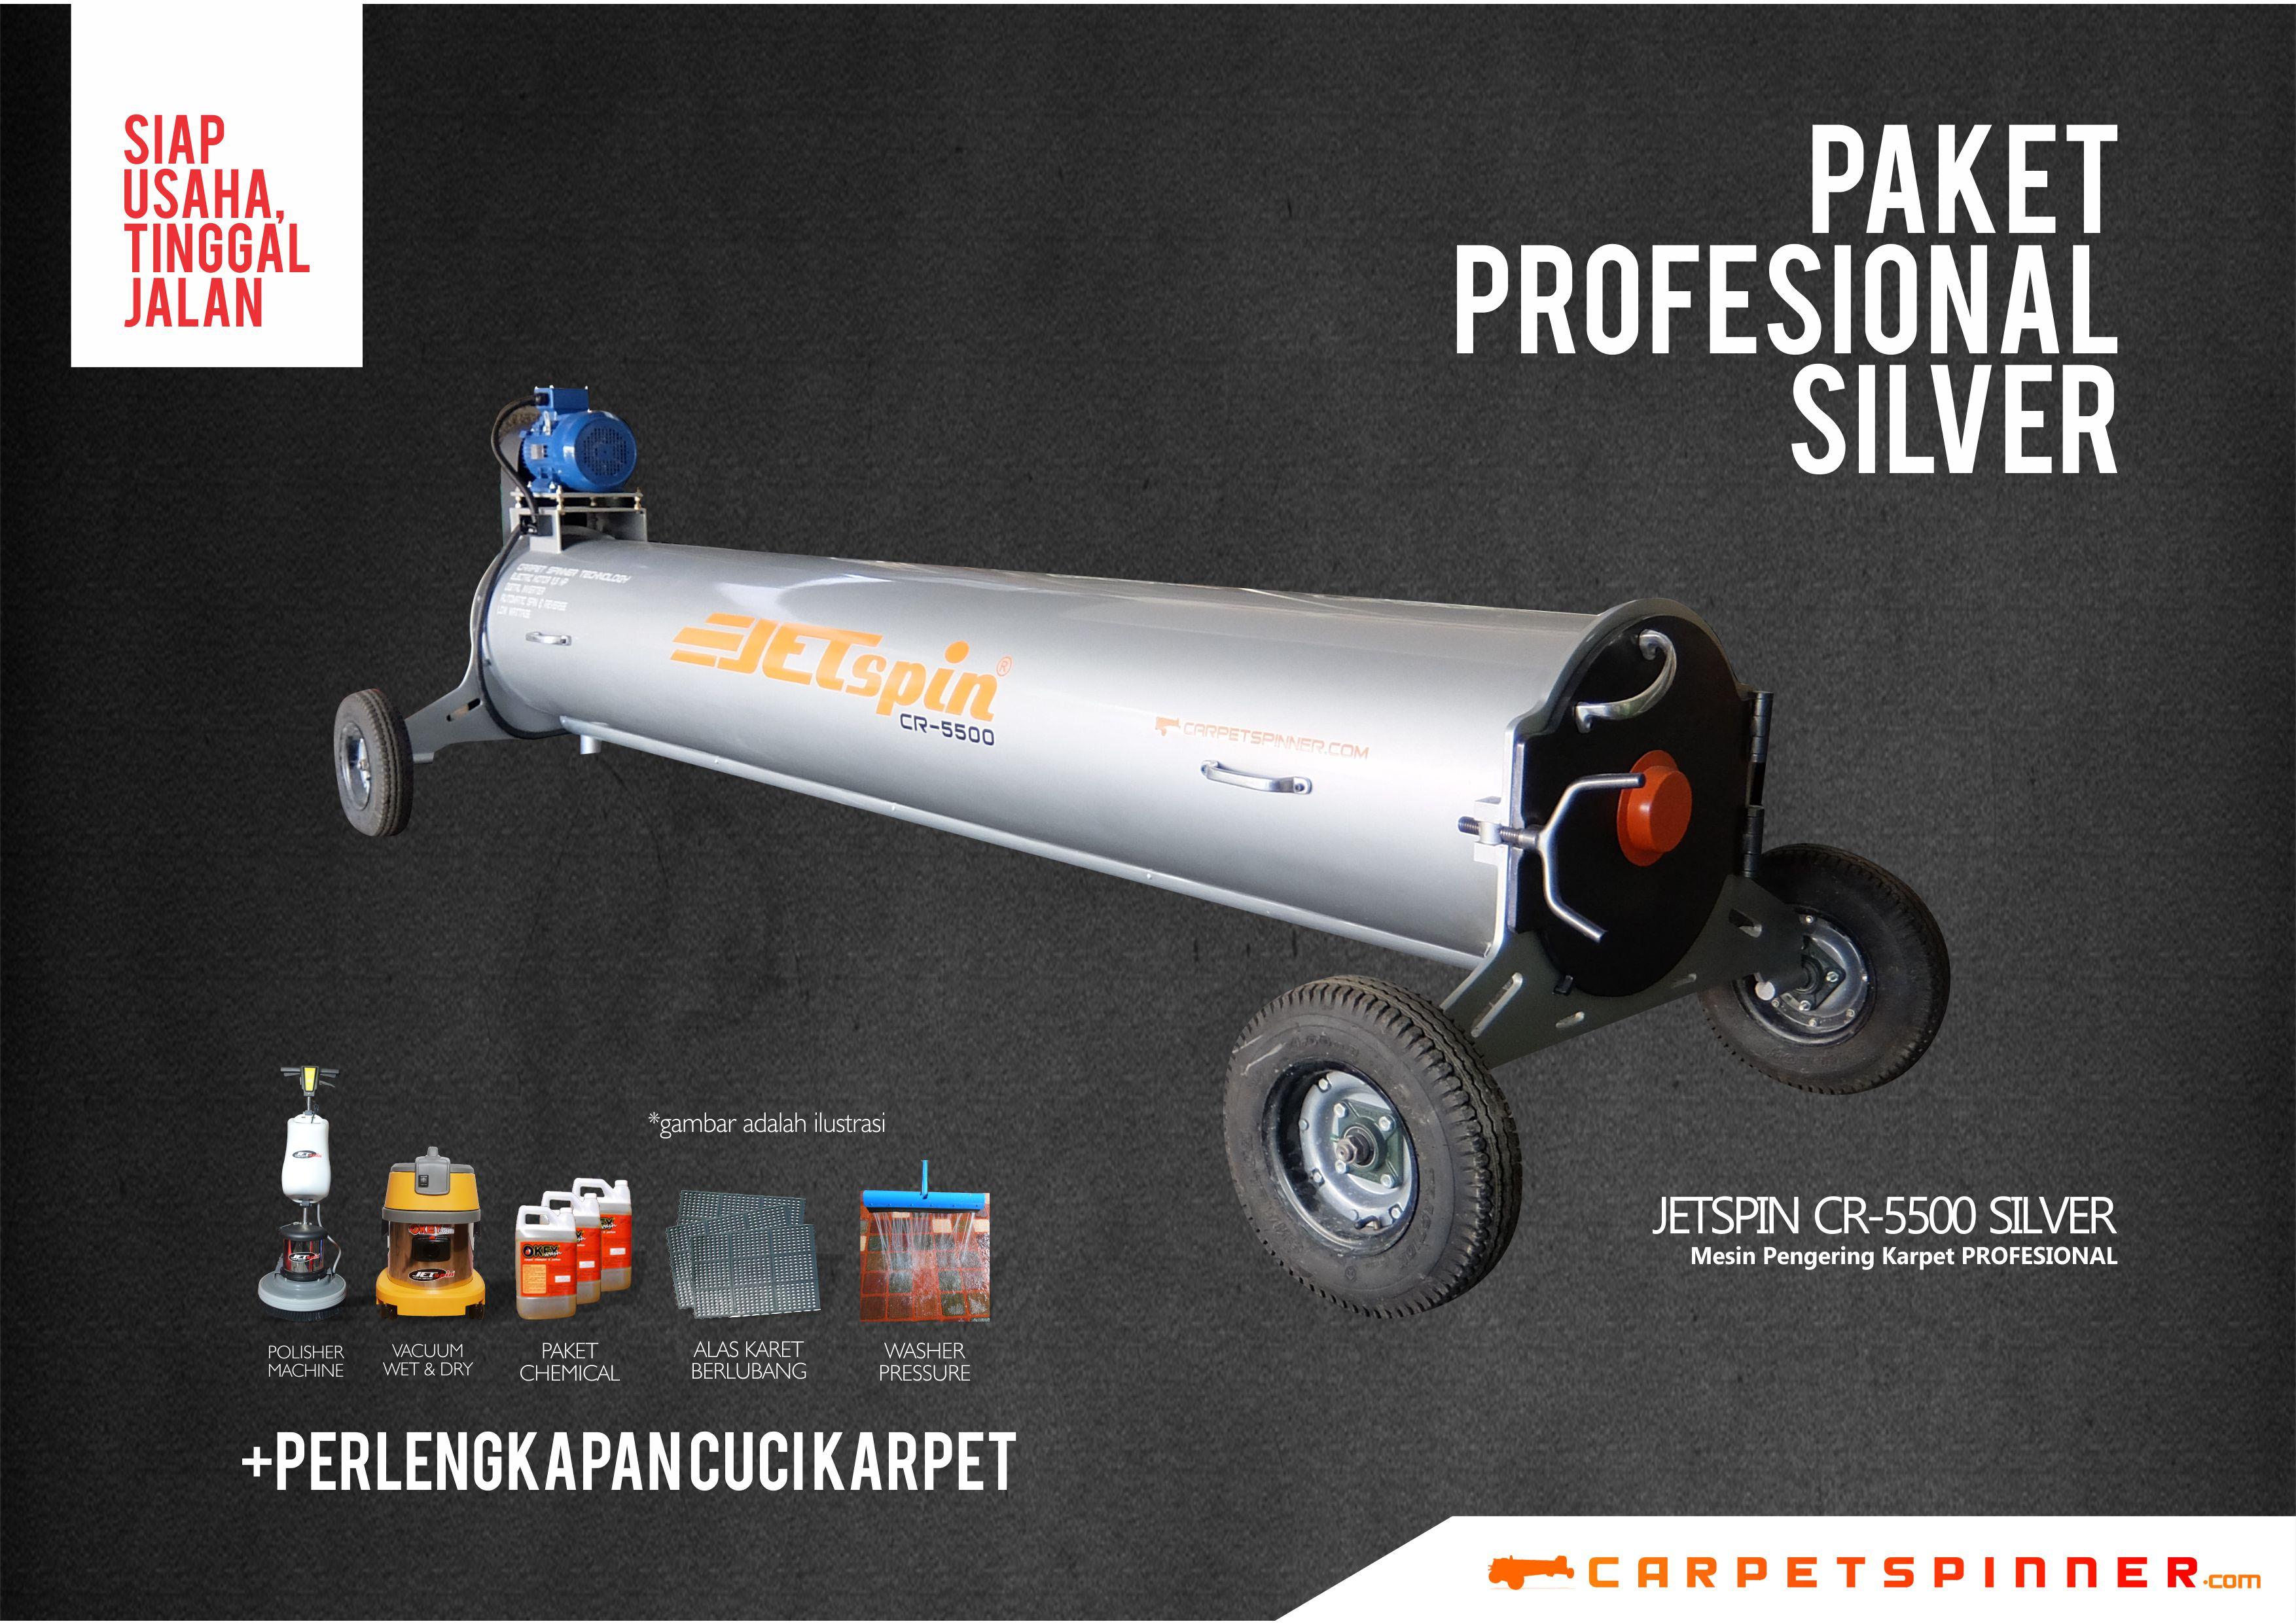 Paket Profesional Silver - www.carpetspinner.com